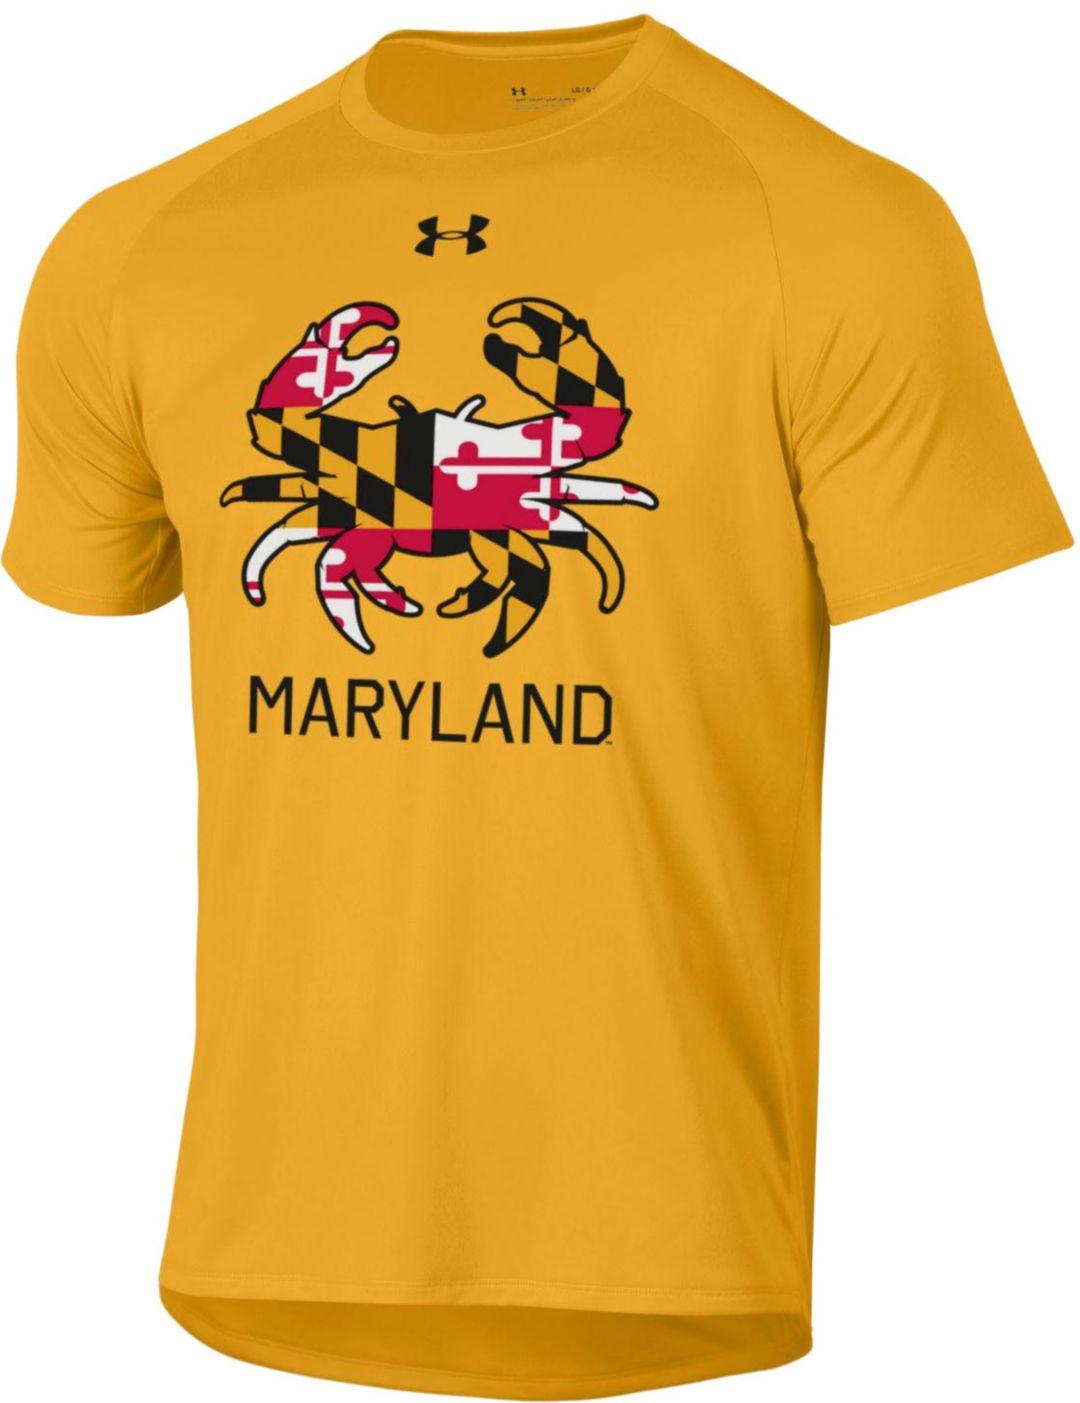 b65e9b40 Under Armour Men's Maryland Terrapins Gold 'Maryland Pride' Tech  Performance T-Shirt